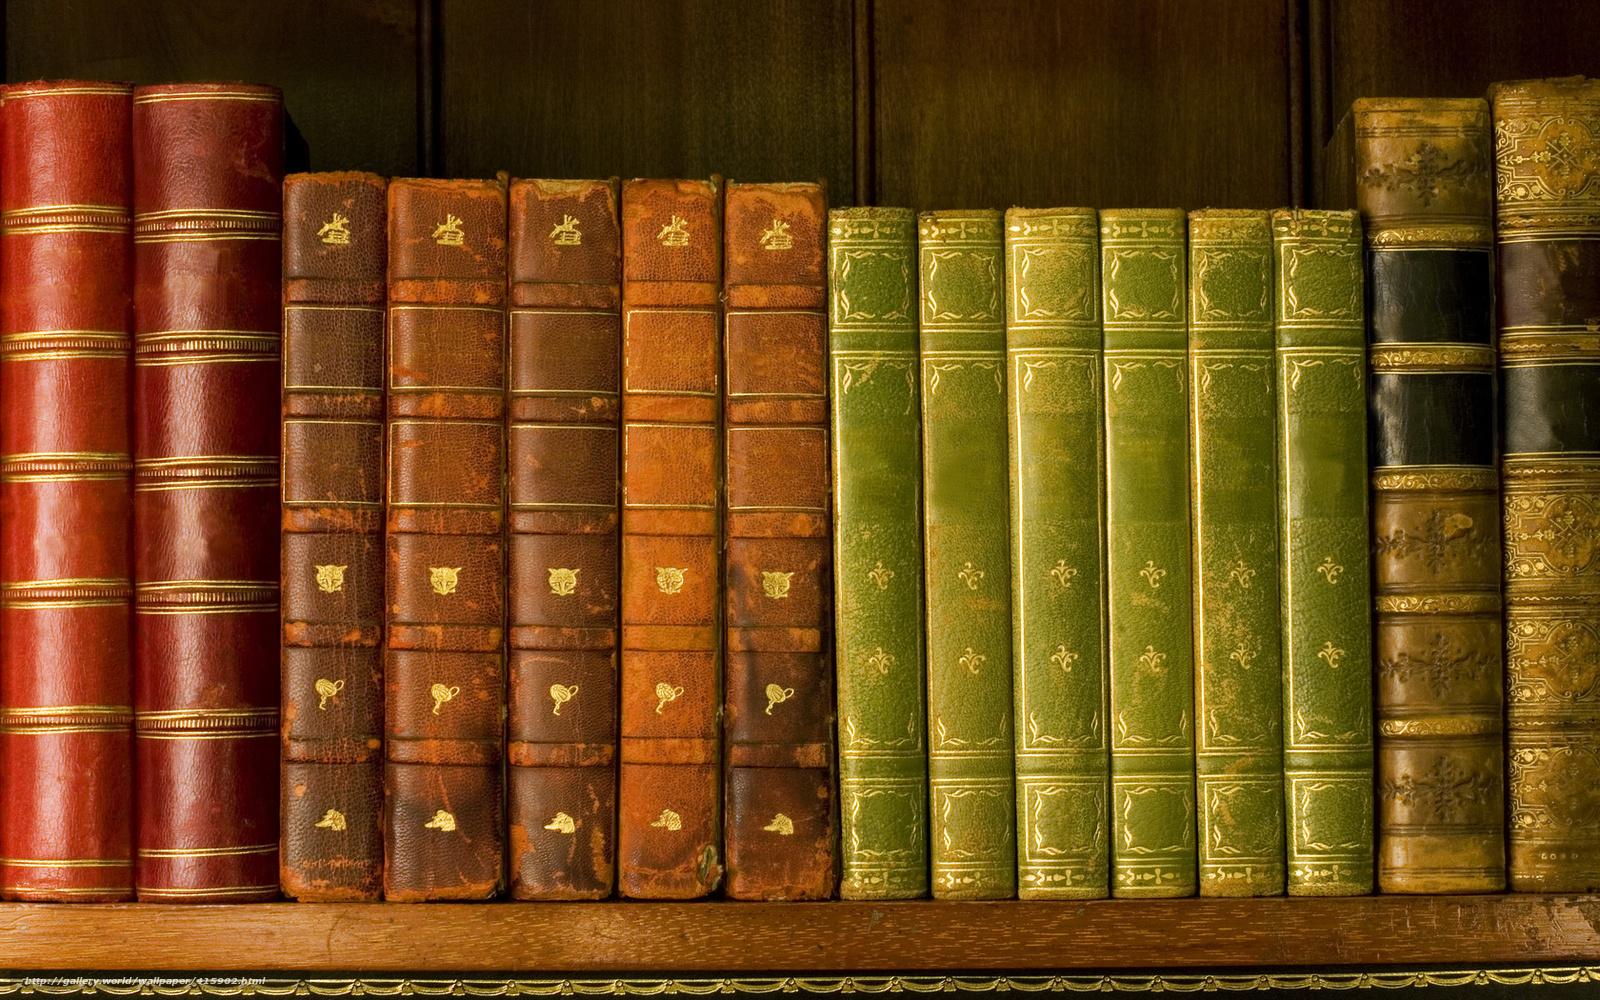 Download wallpaper books roots shelf library free desktop wallpaper